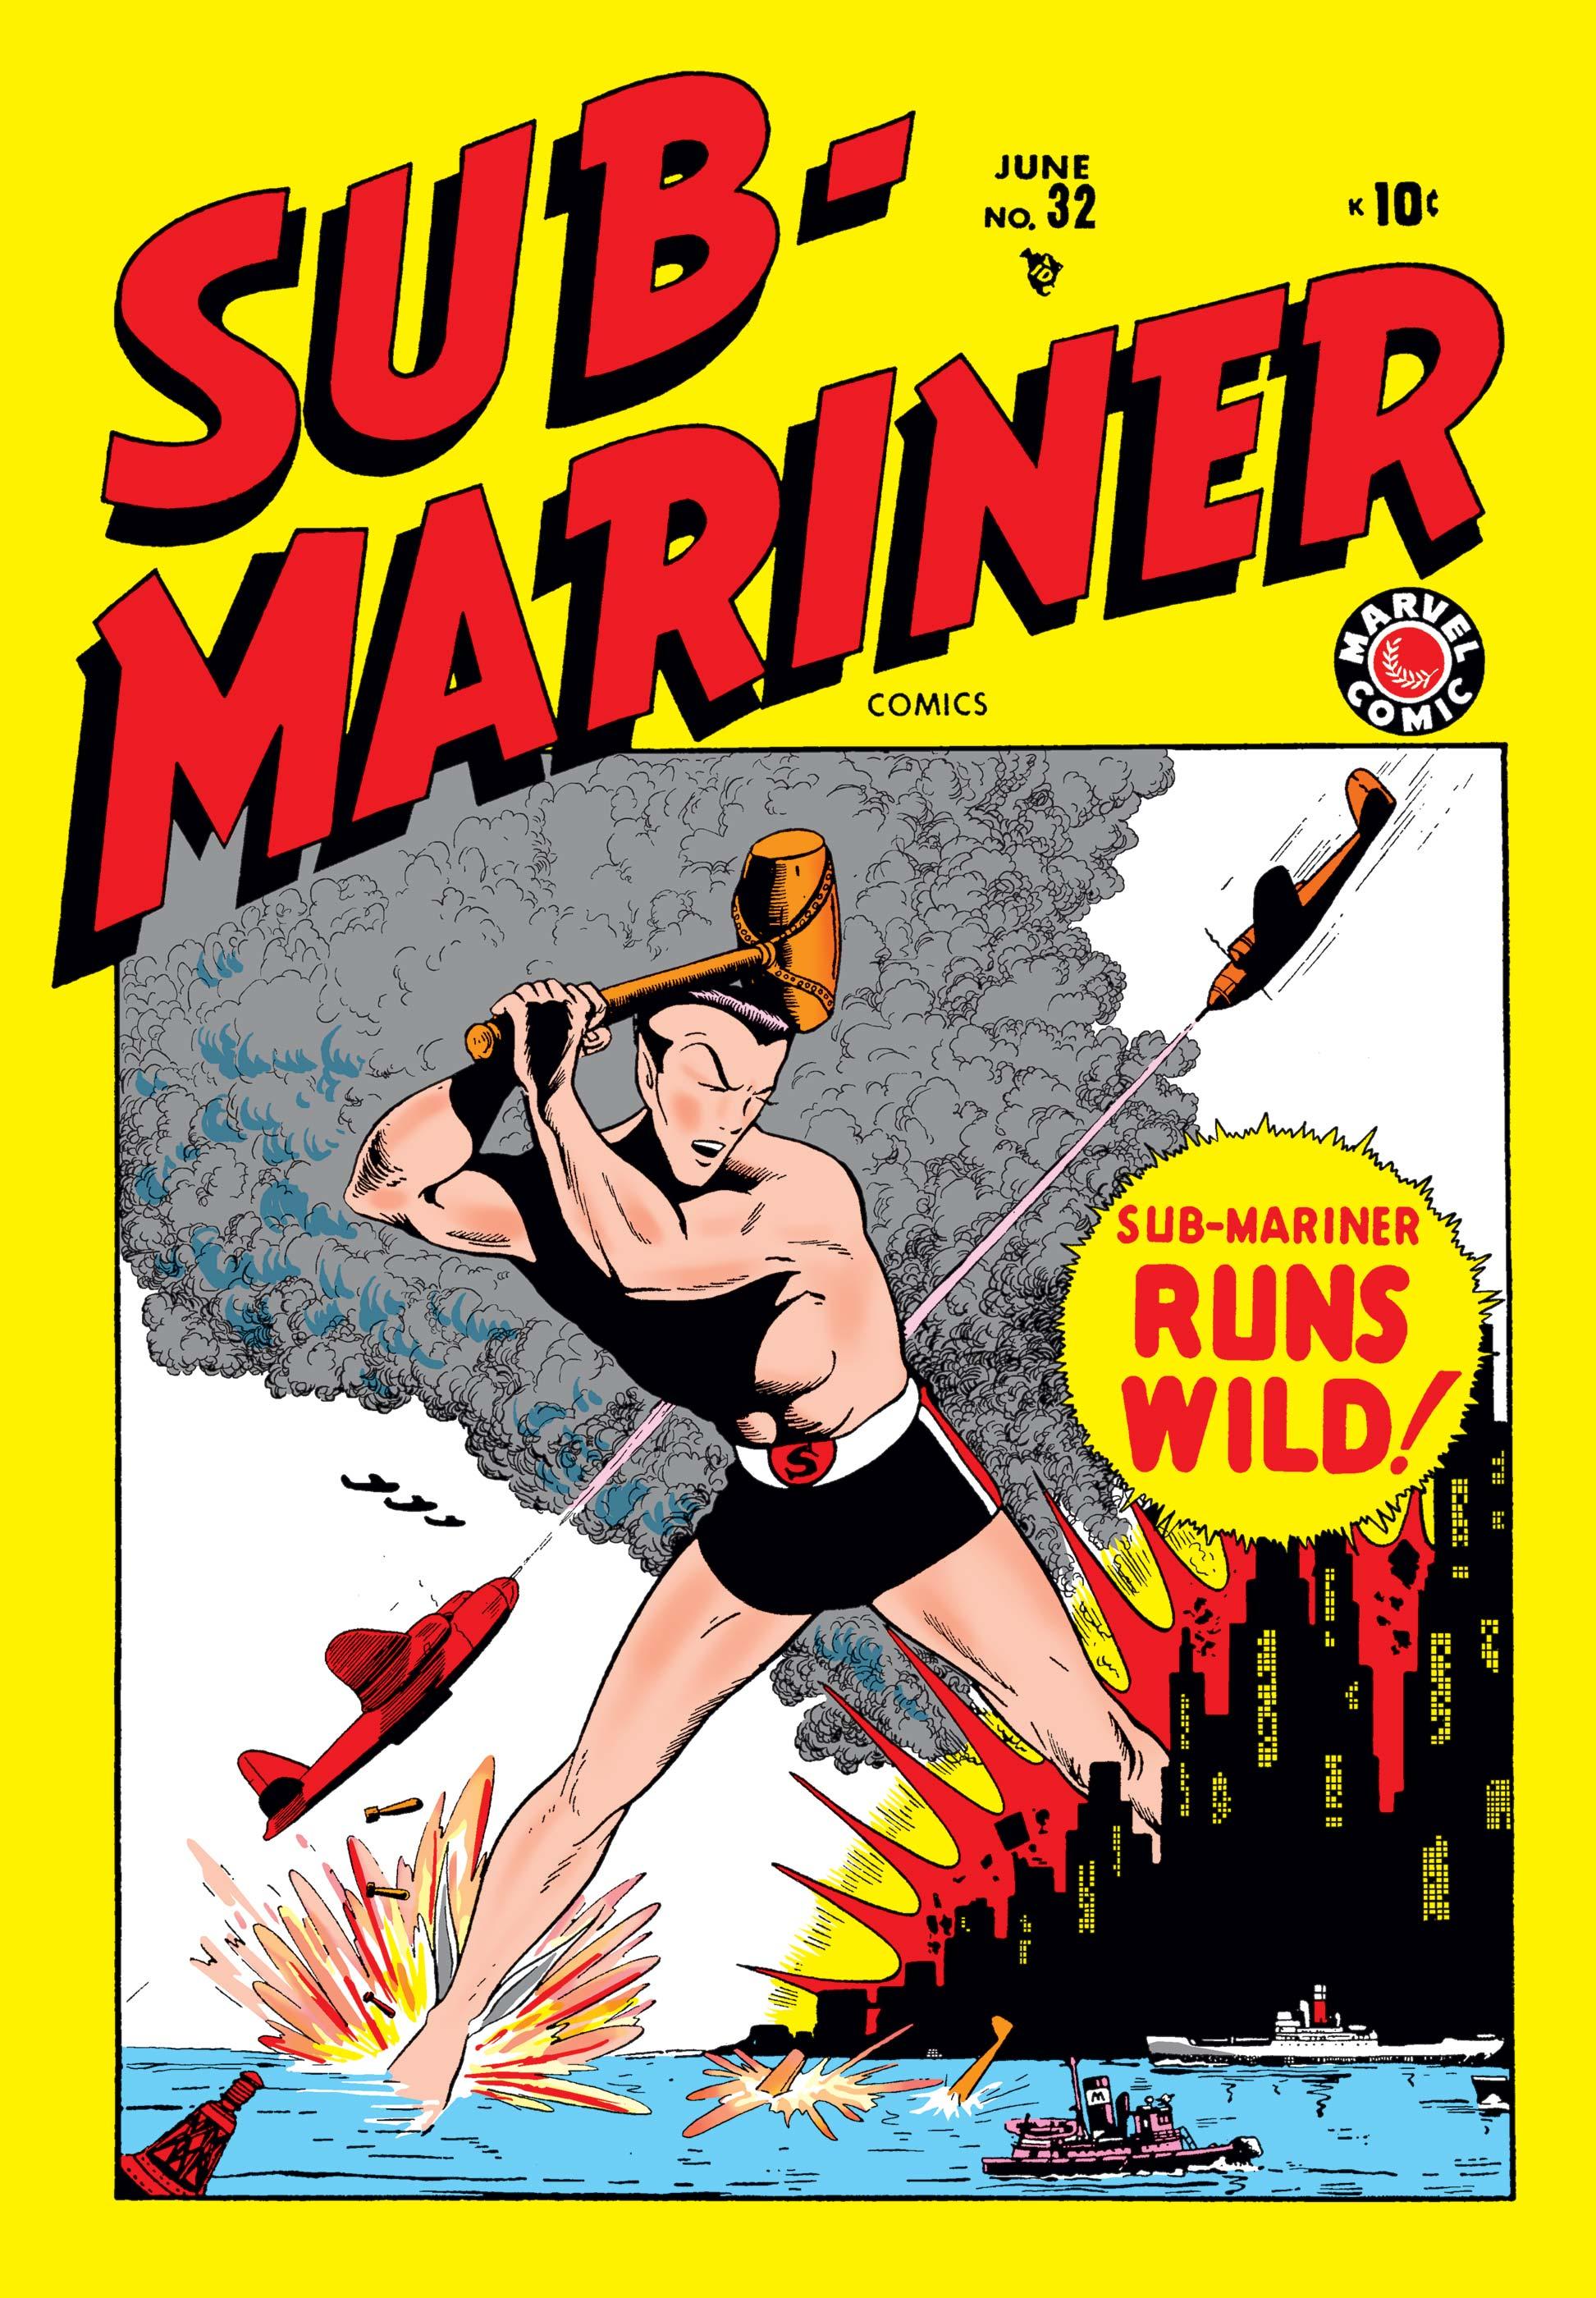 Sub-Mariner Comics (1941) #32